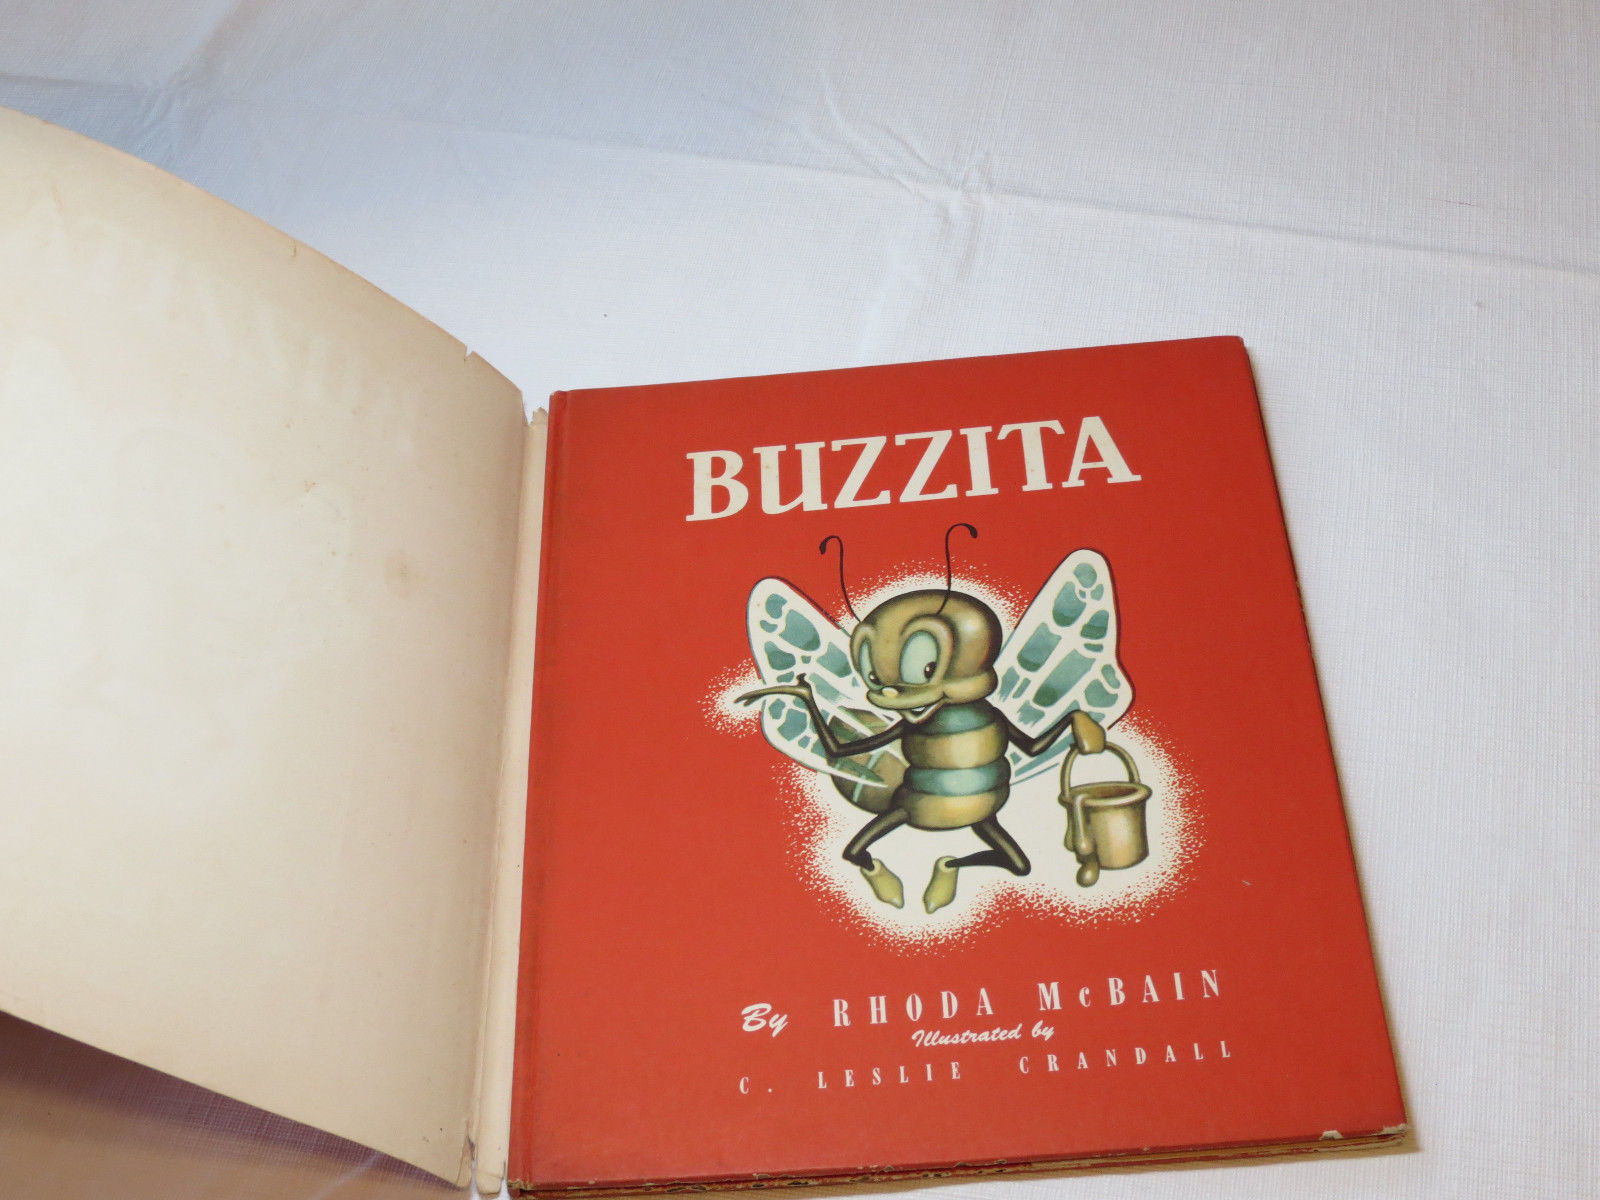 Buzzita by Rhoda McBainBumble Bees Book Hardcover Vintage RARE 1948 Illustrated